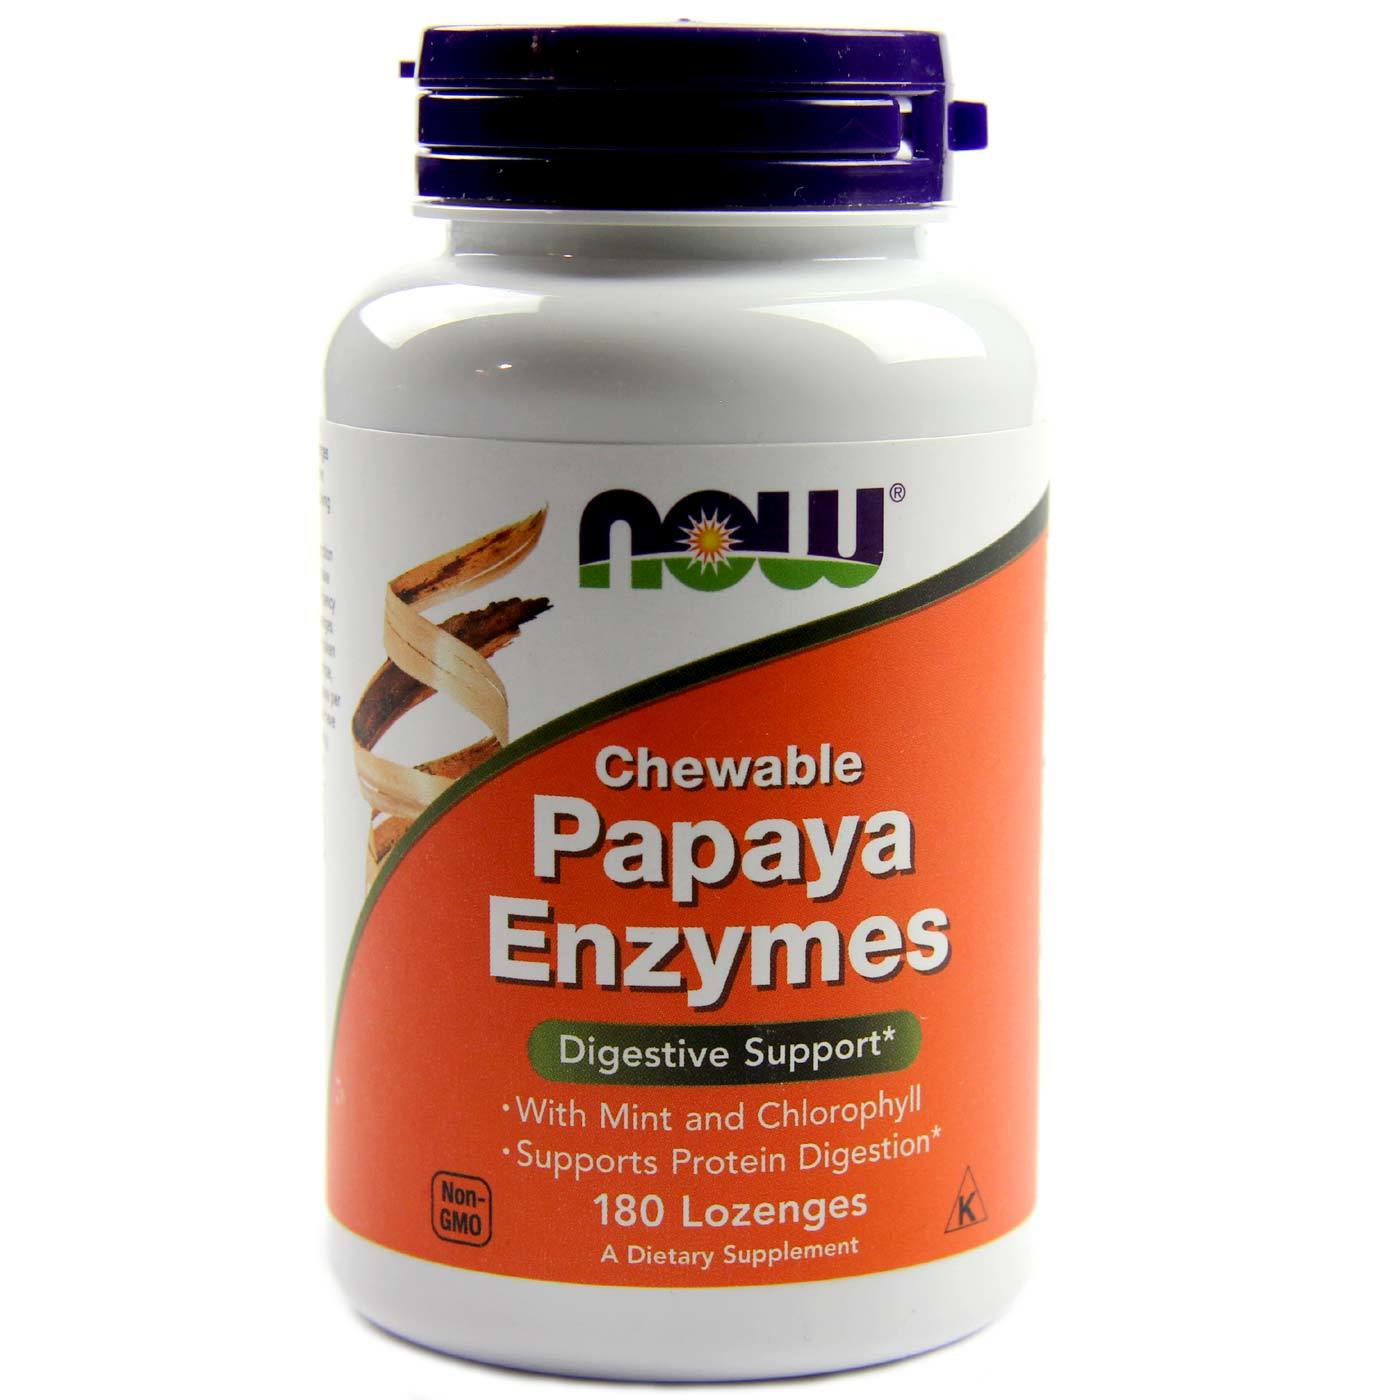 Now papaya enzymes